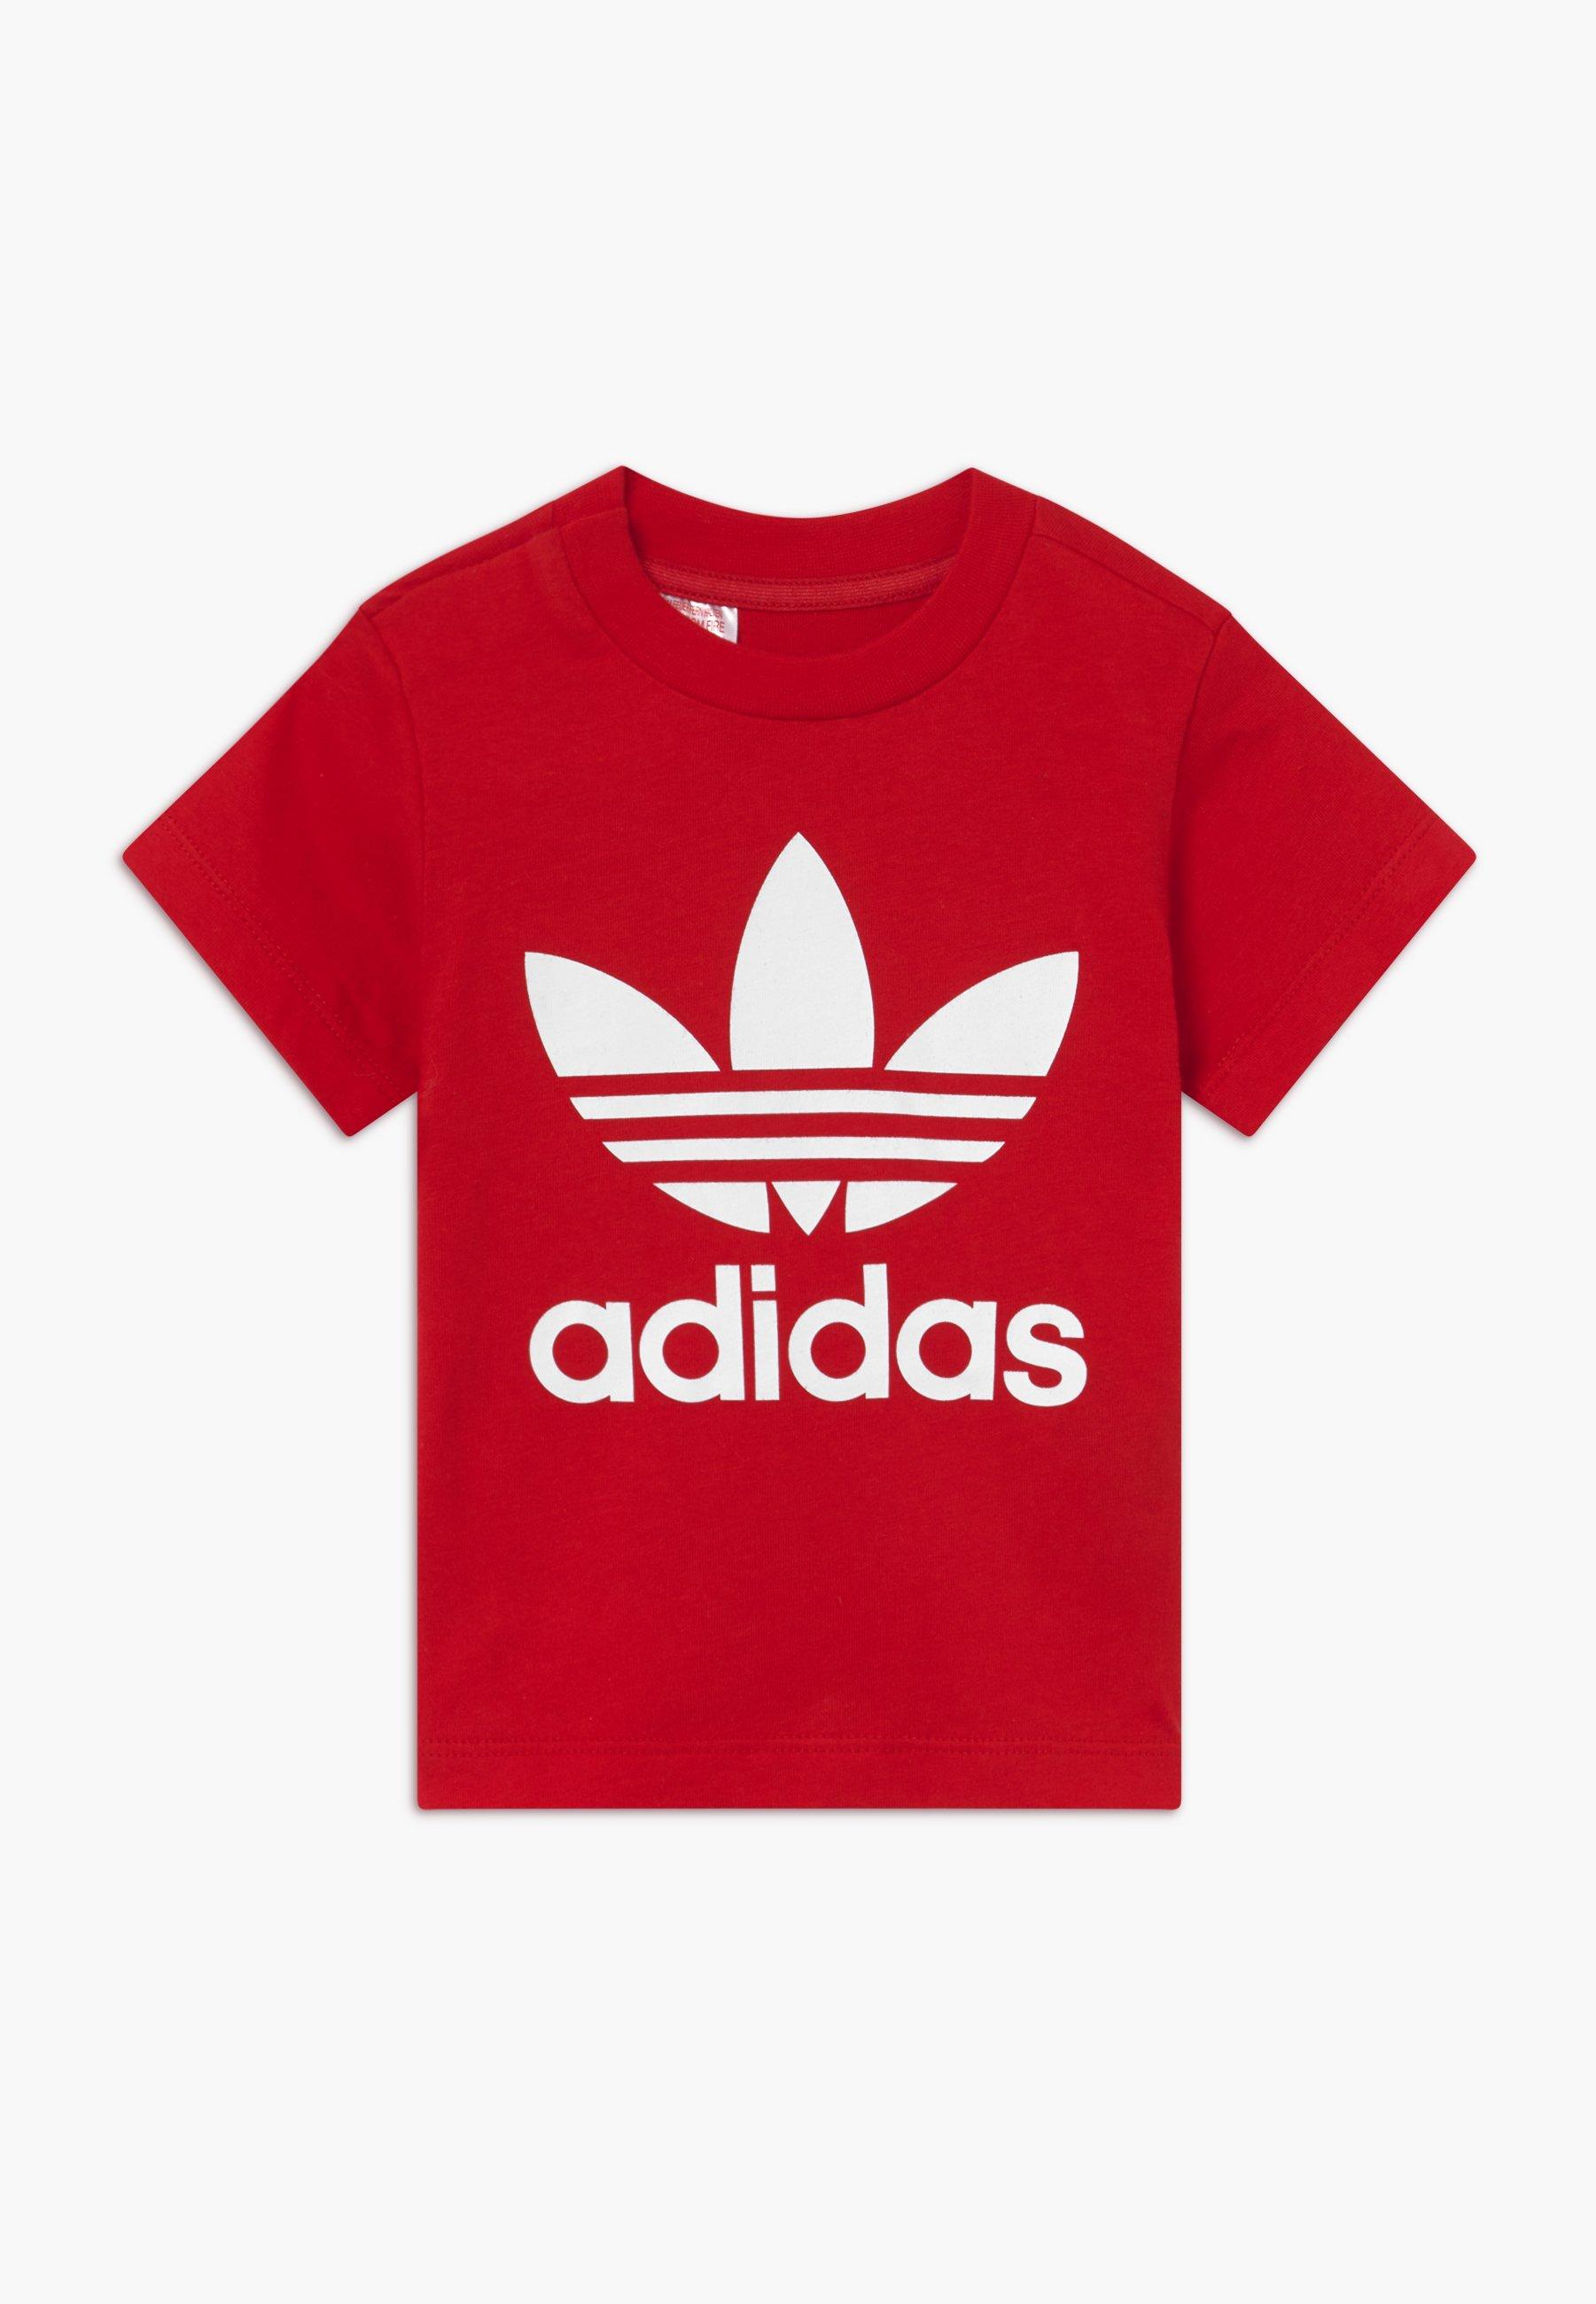 adidas Originals TREFOIL TEE T shirt imprimé scarle